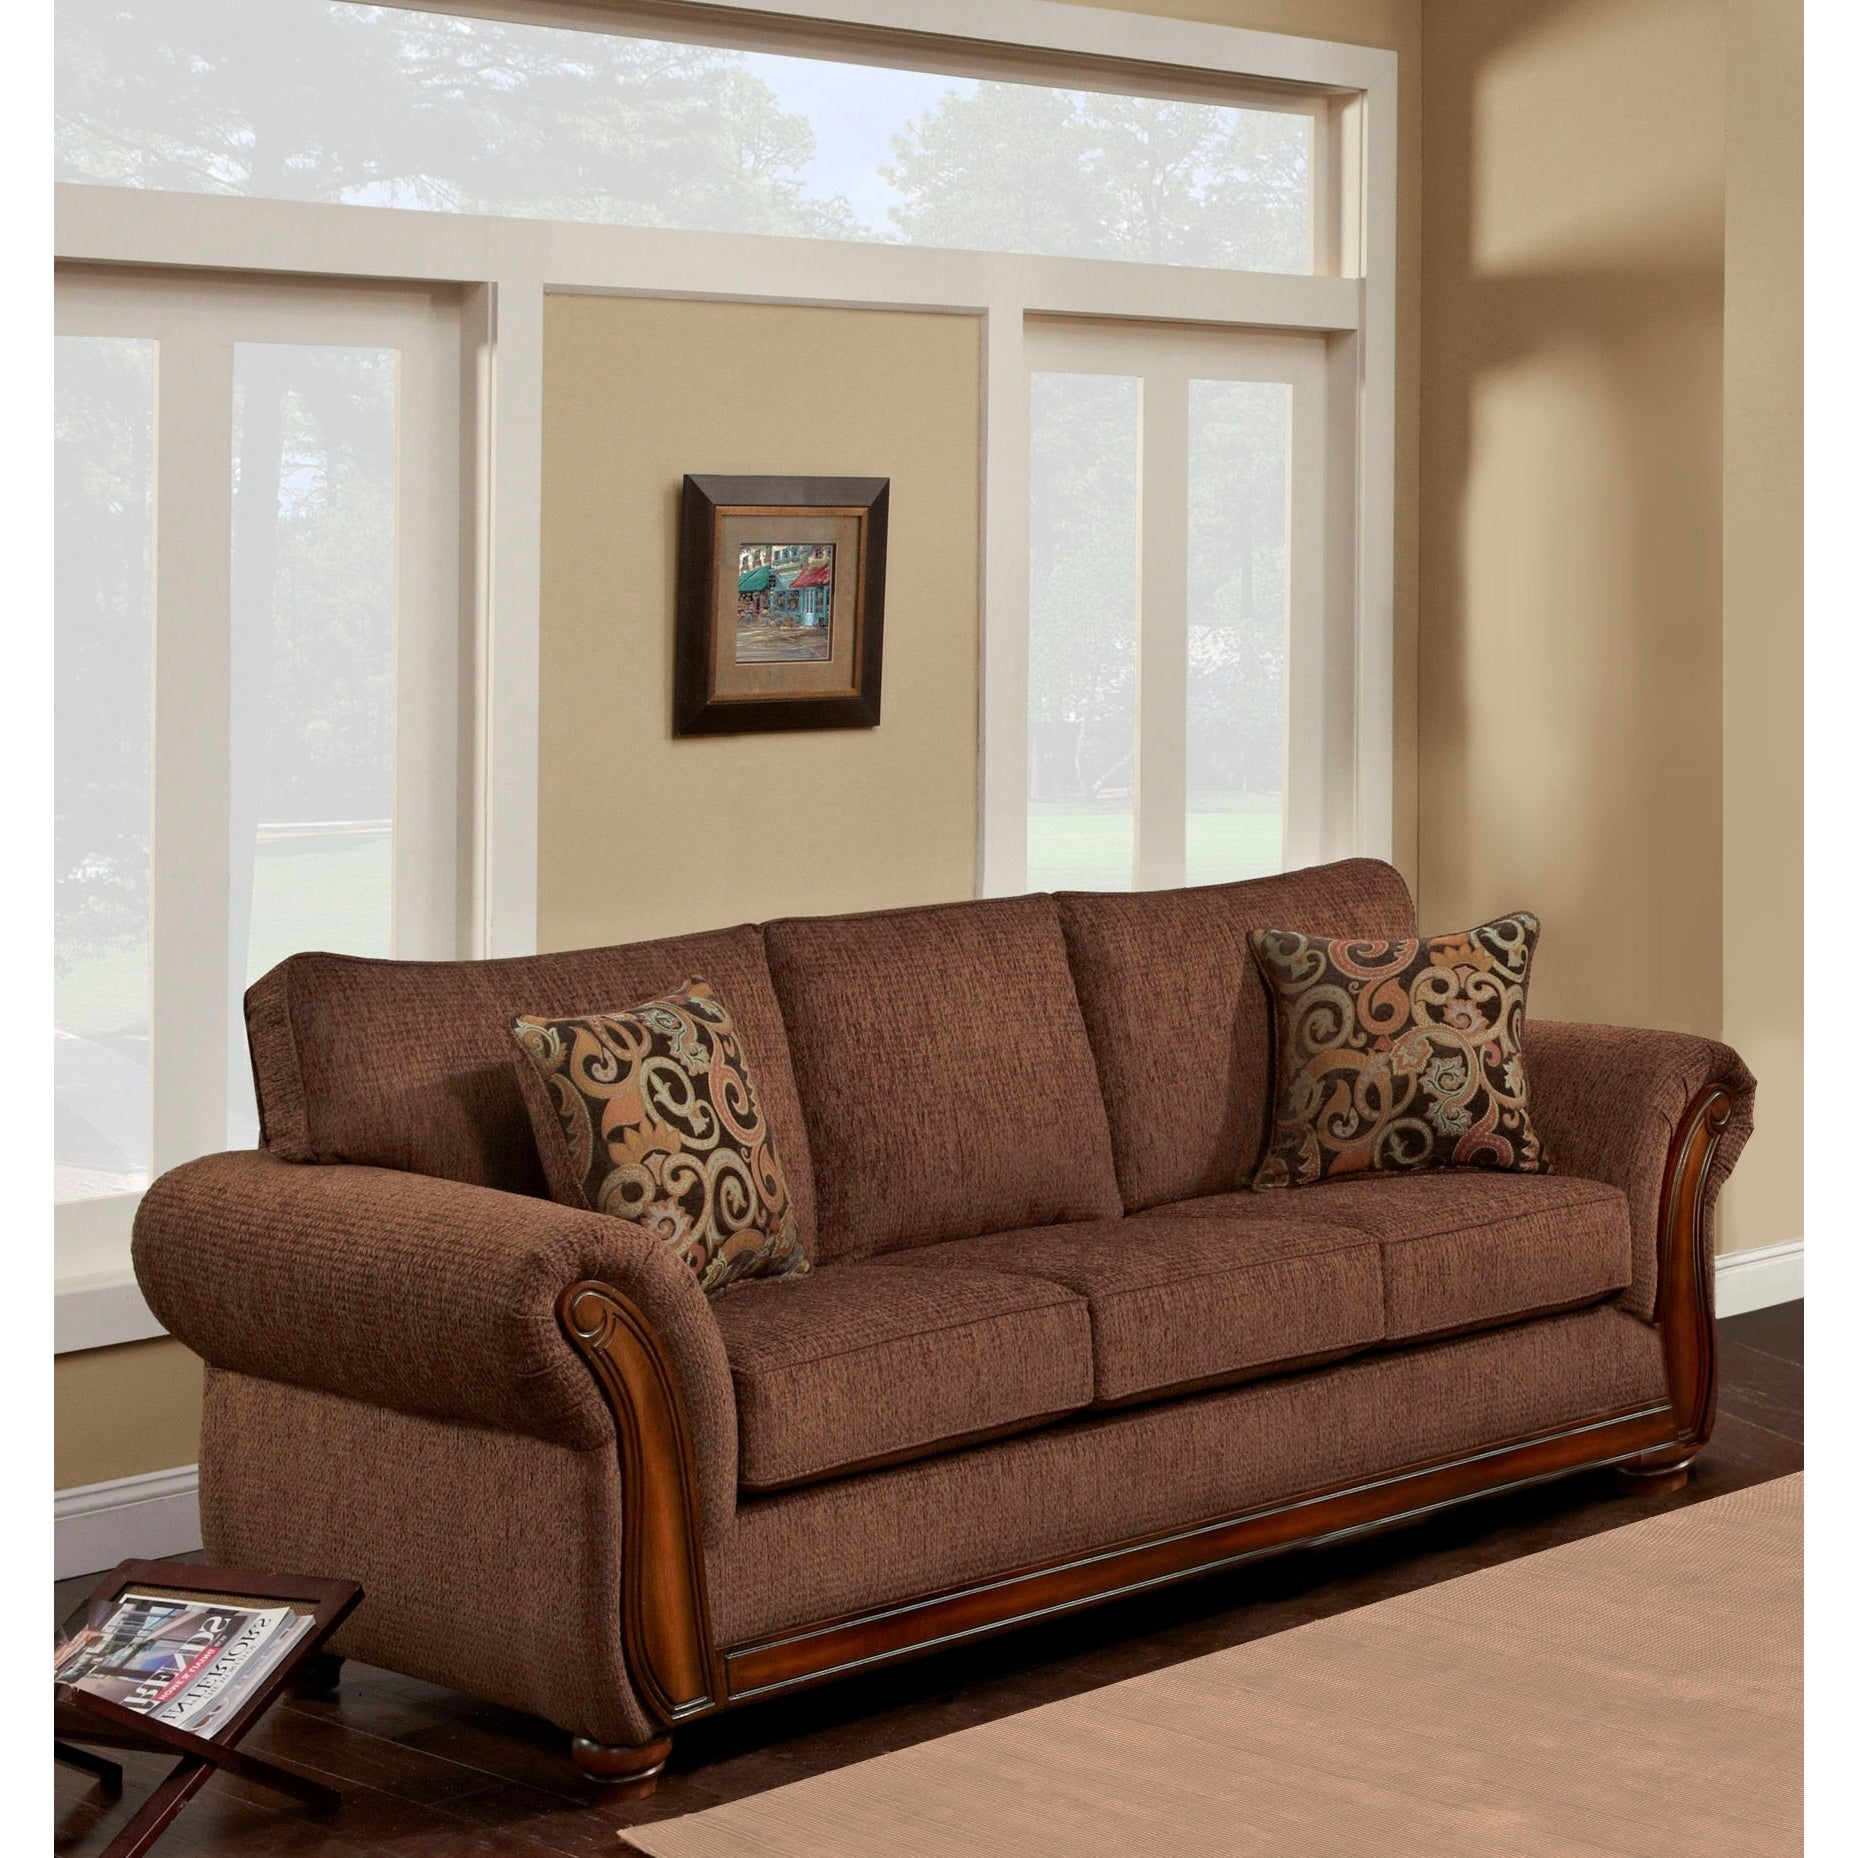 Sofa Trendz Beige Brown Microfiber Wood Tri tone